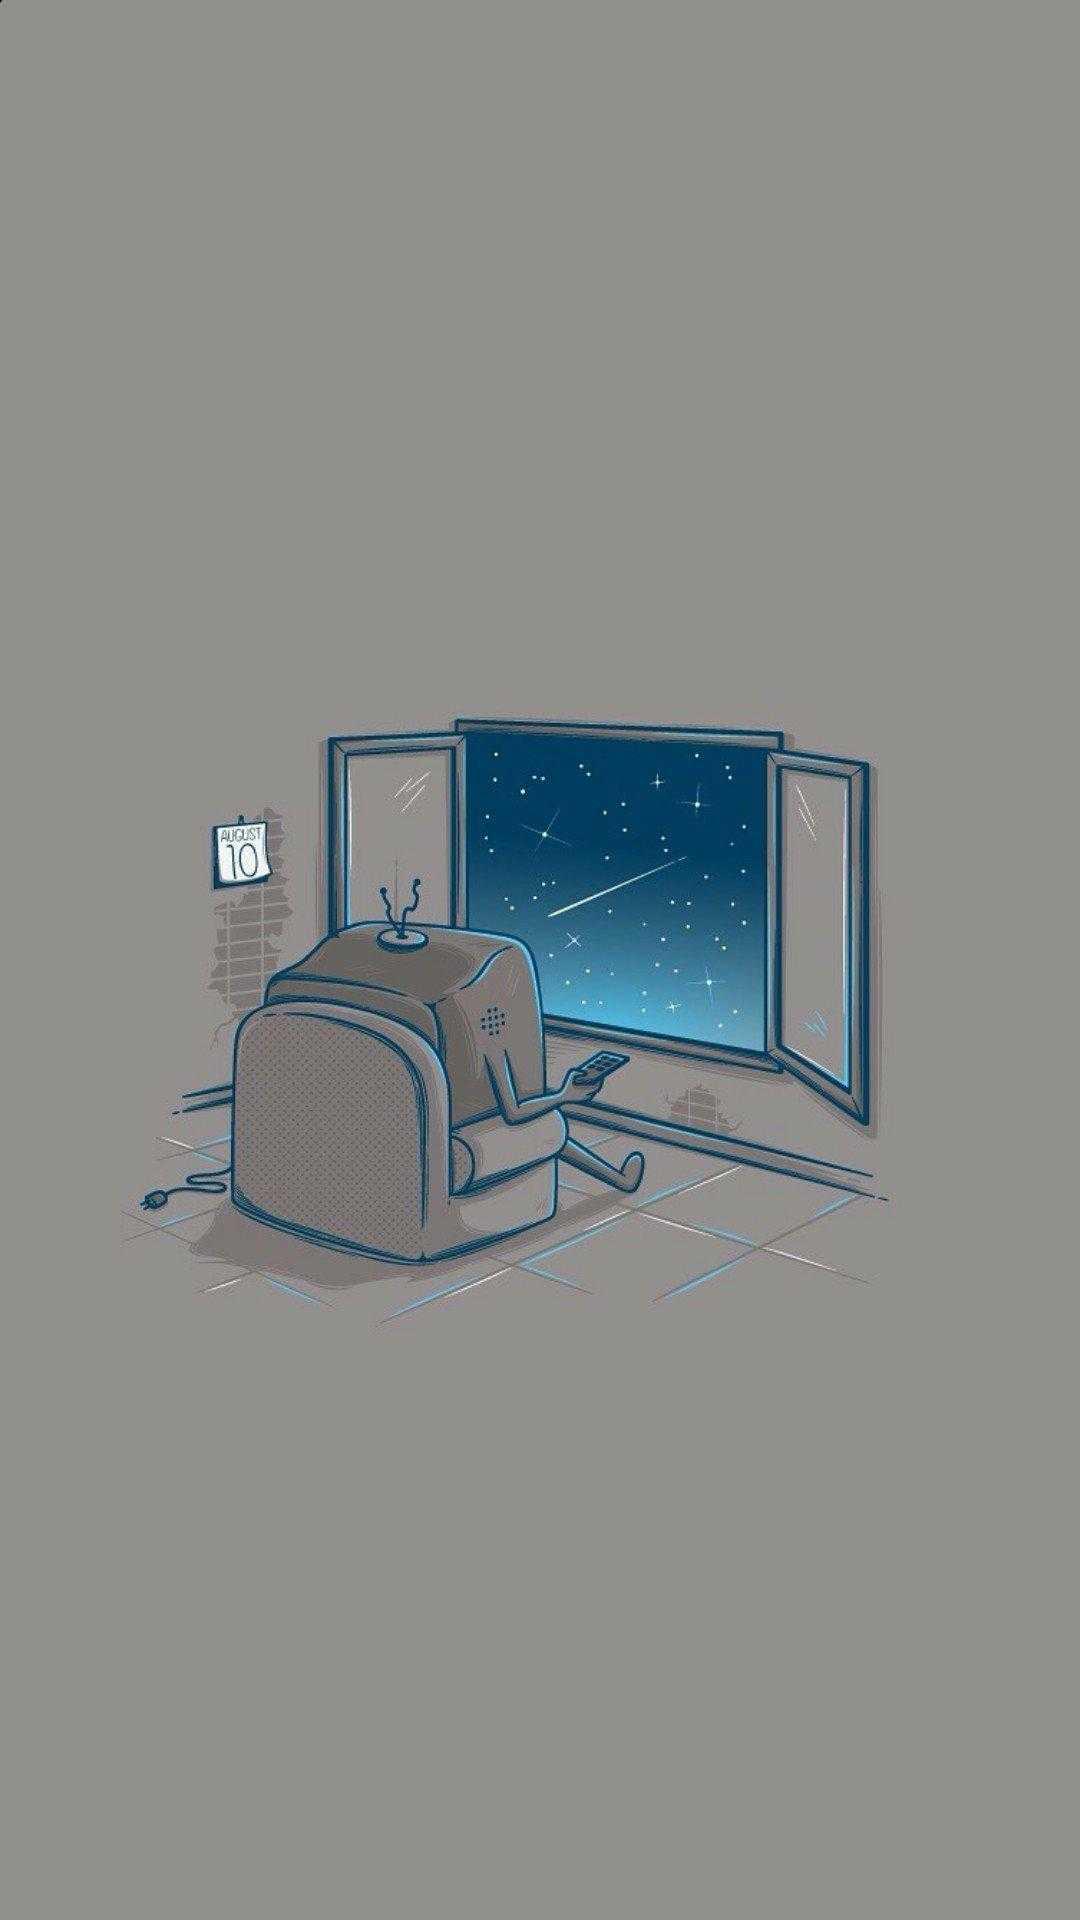 Space Minimal Art Wallpaper Iphone Plus Illustration